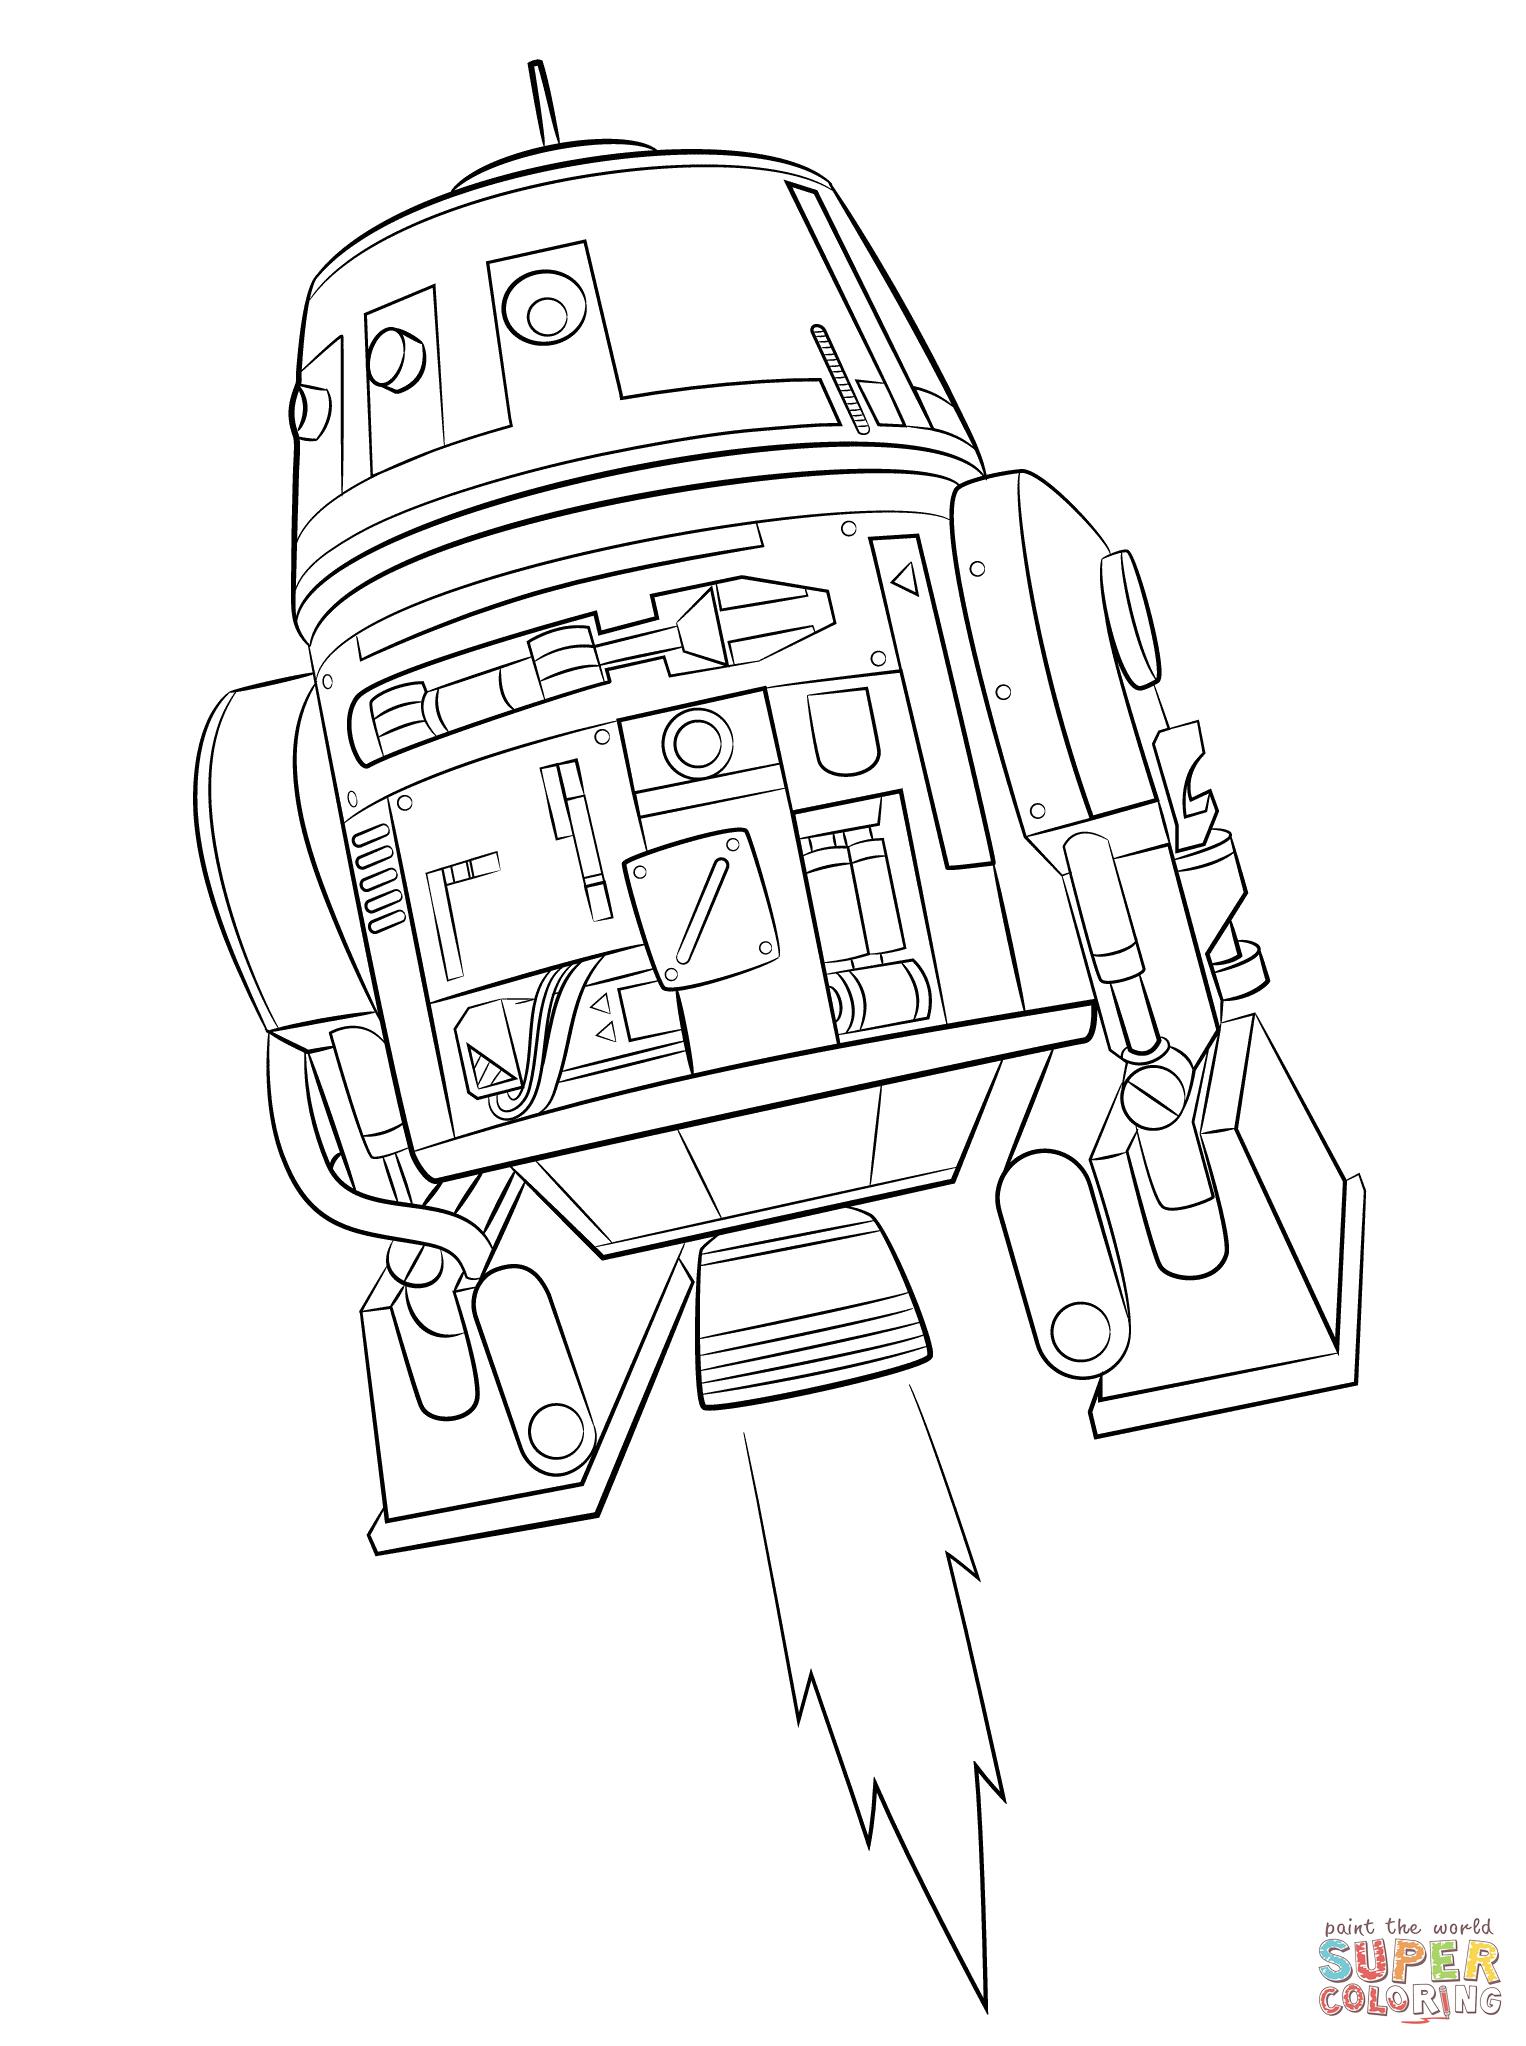 Star Wars Rebels Chopper Super Coloring Star Wars Coloring Book Star Wars Drawings Star Wars Coloring Sheet